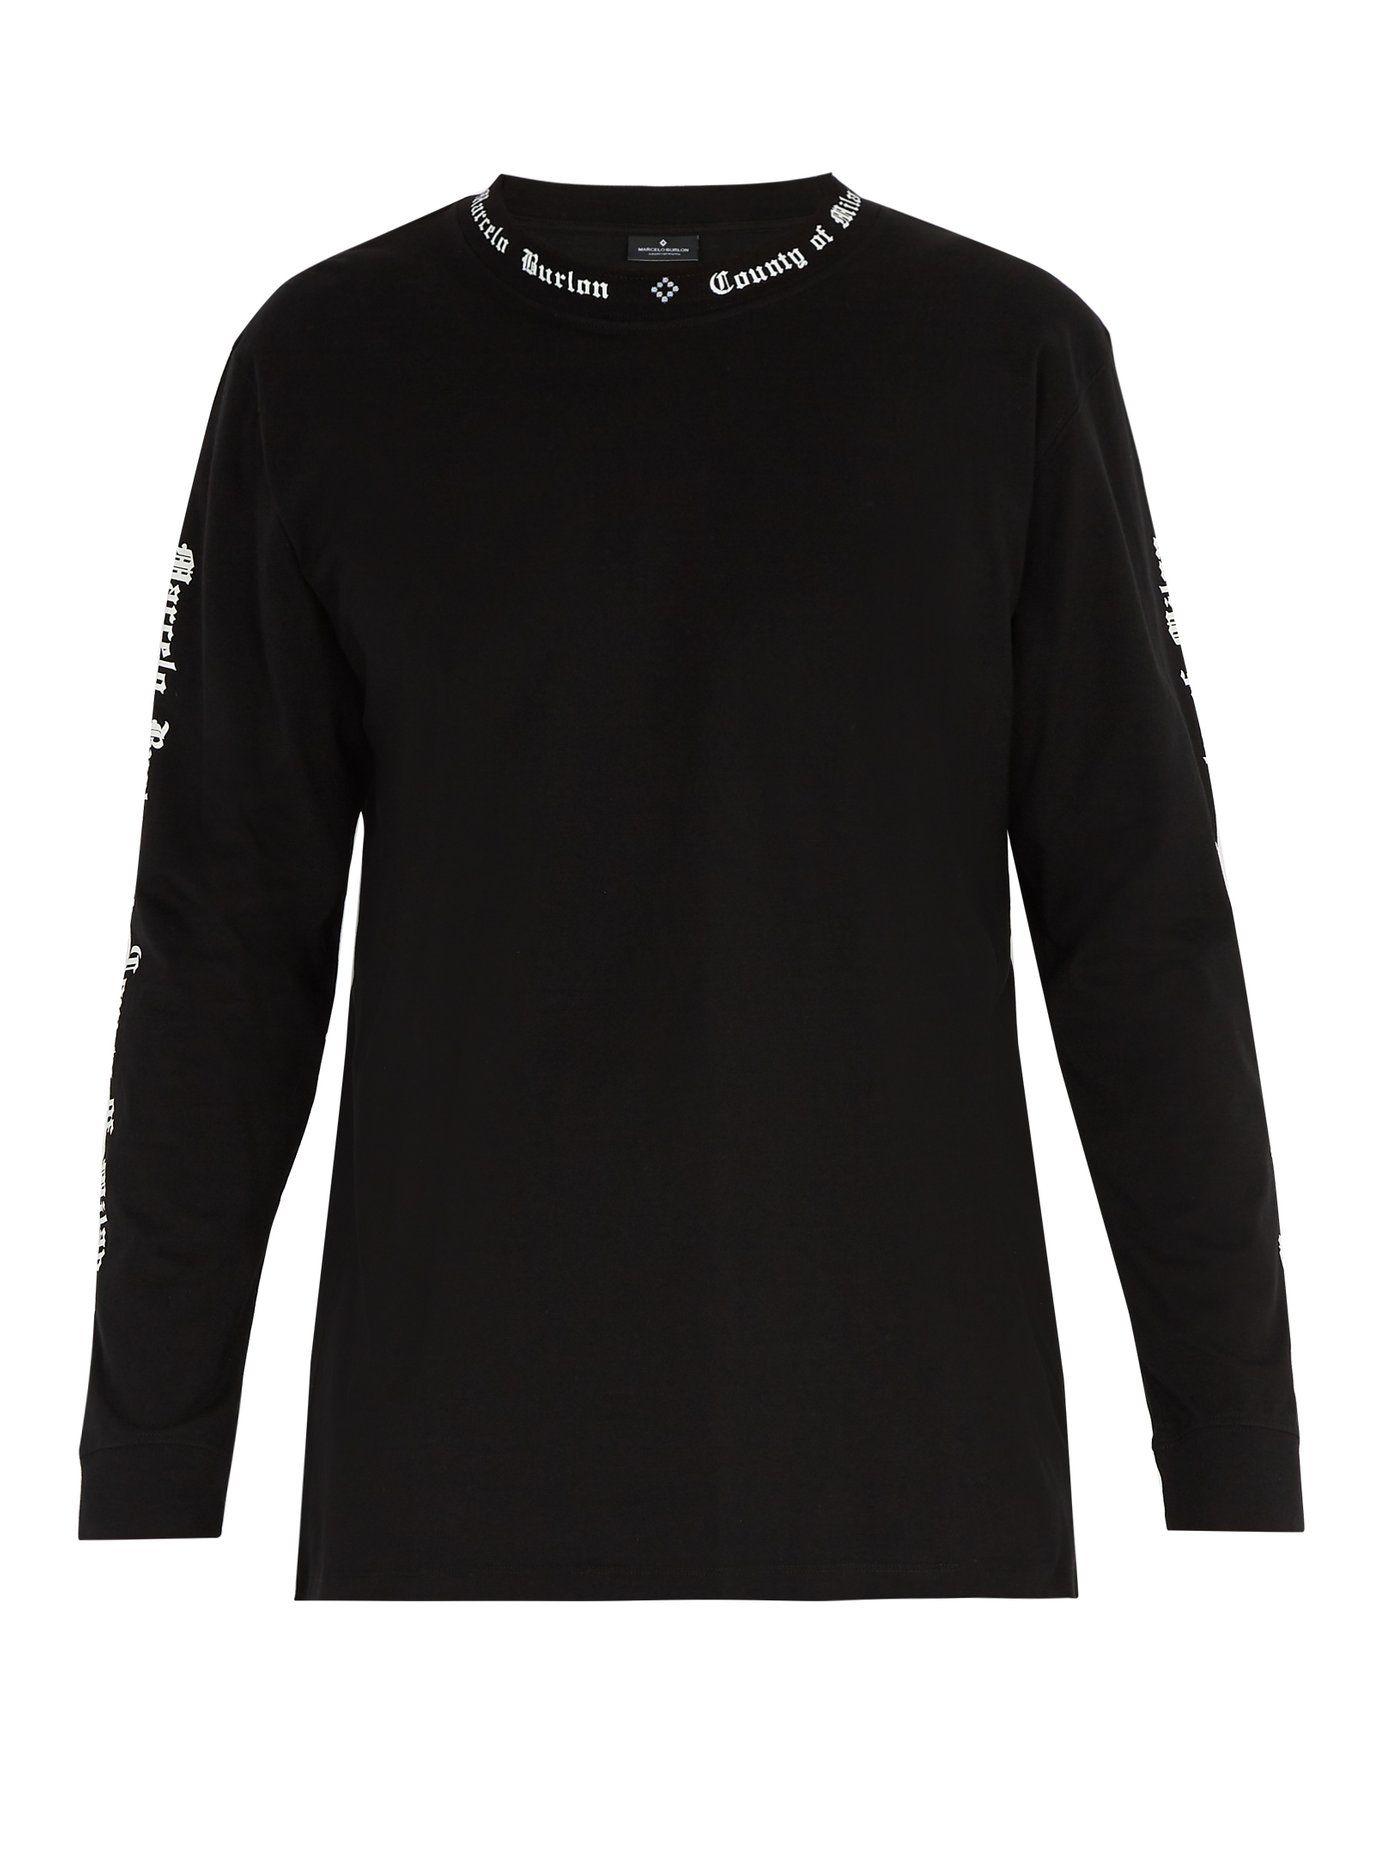 Logo-print long-sleeved cotton T-shirt Marcelo Burlon Cost Sale Online Fast Express Clearance 2018 Unisex nJVlwtyS